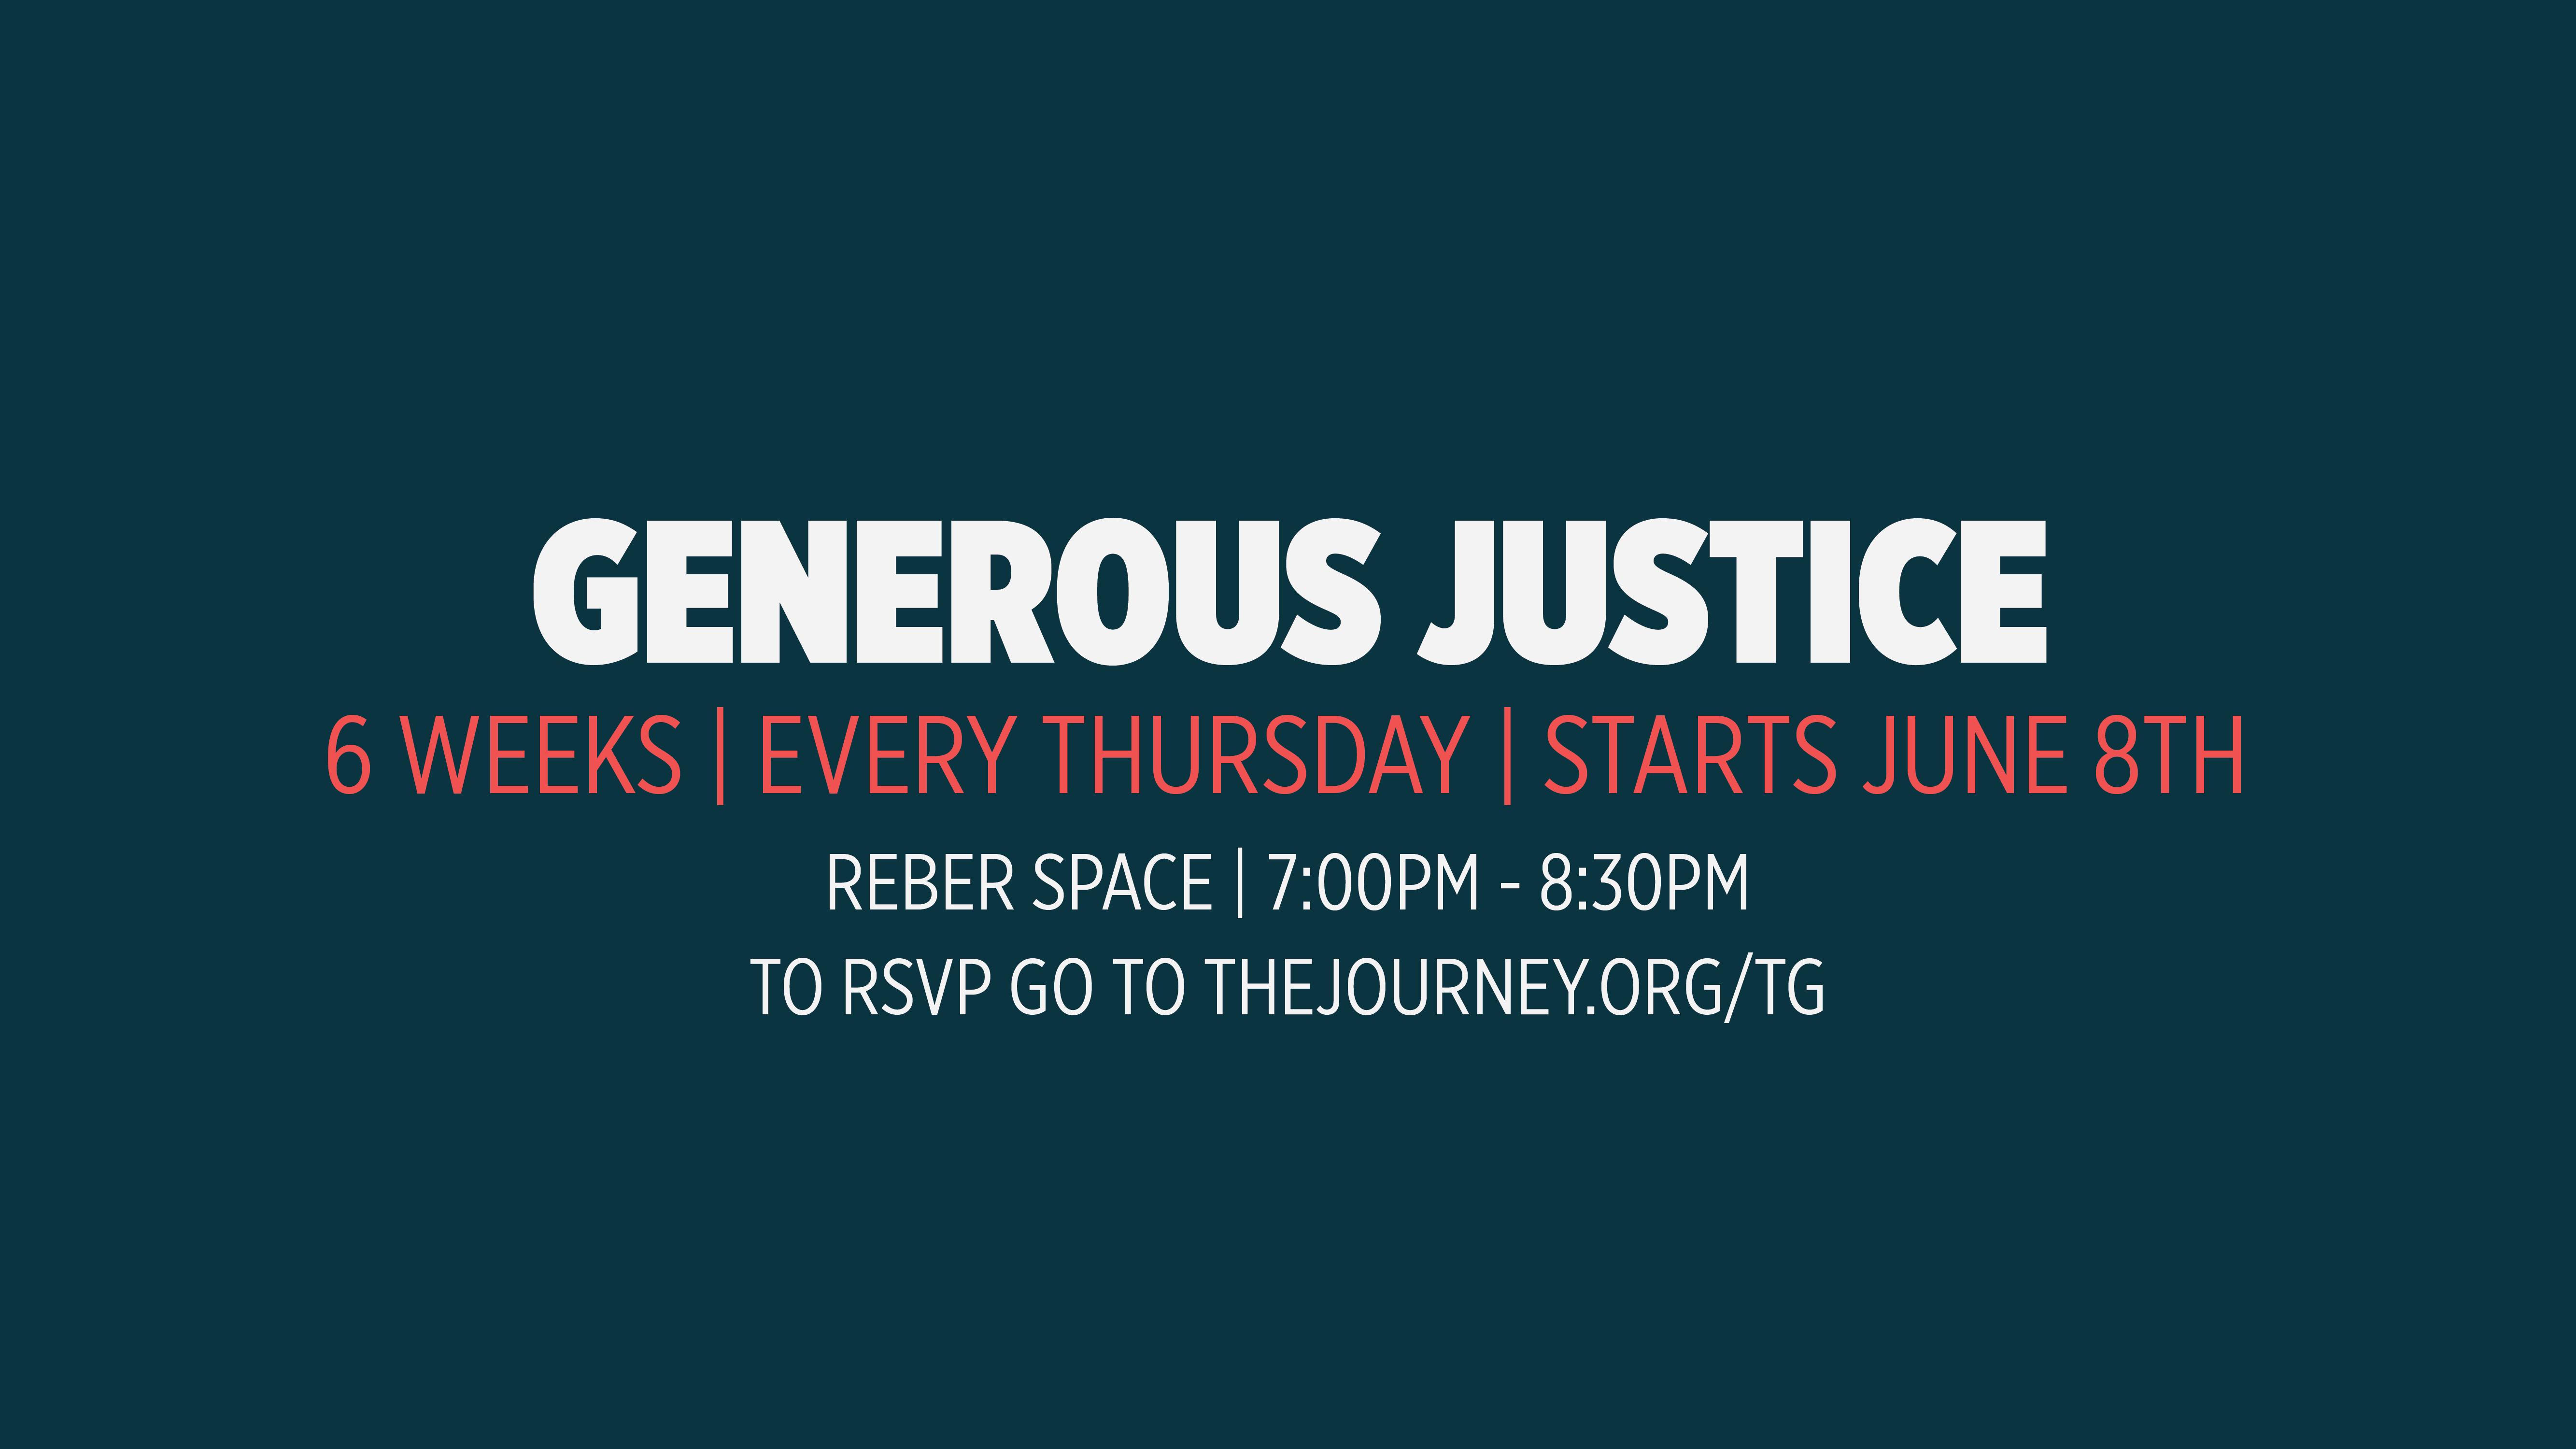 Generous justice slide 01